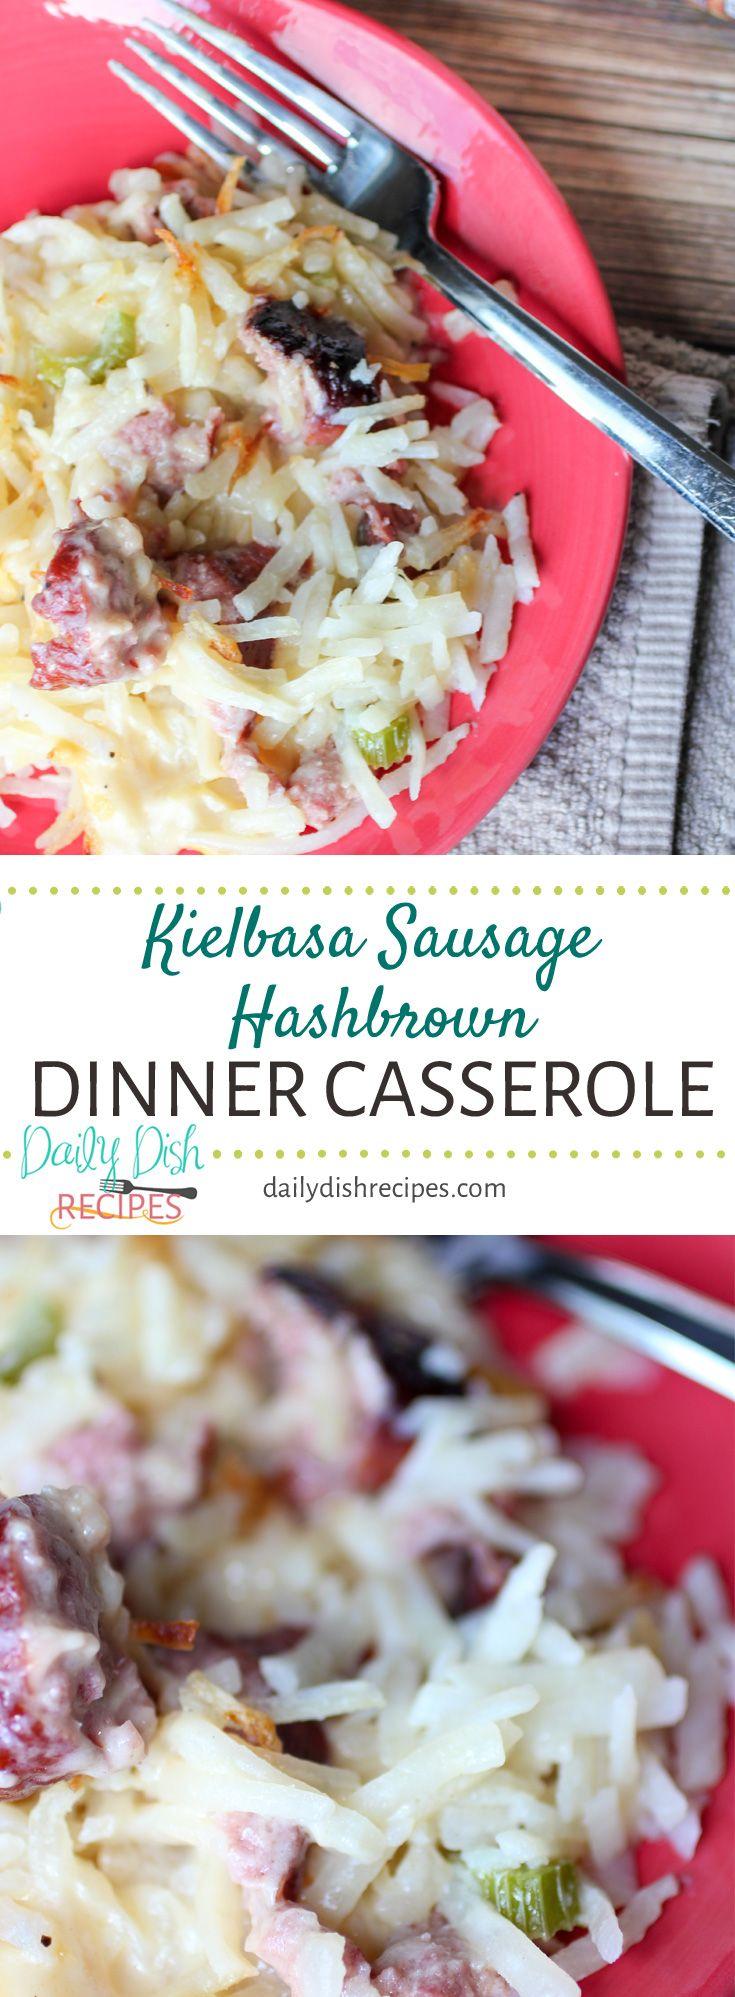 Kielbasa Sausage Hashbrown Dinner Casserole via @d…